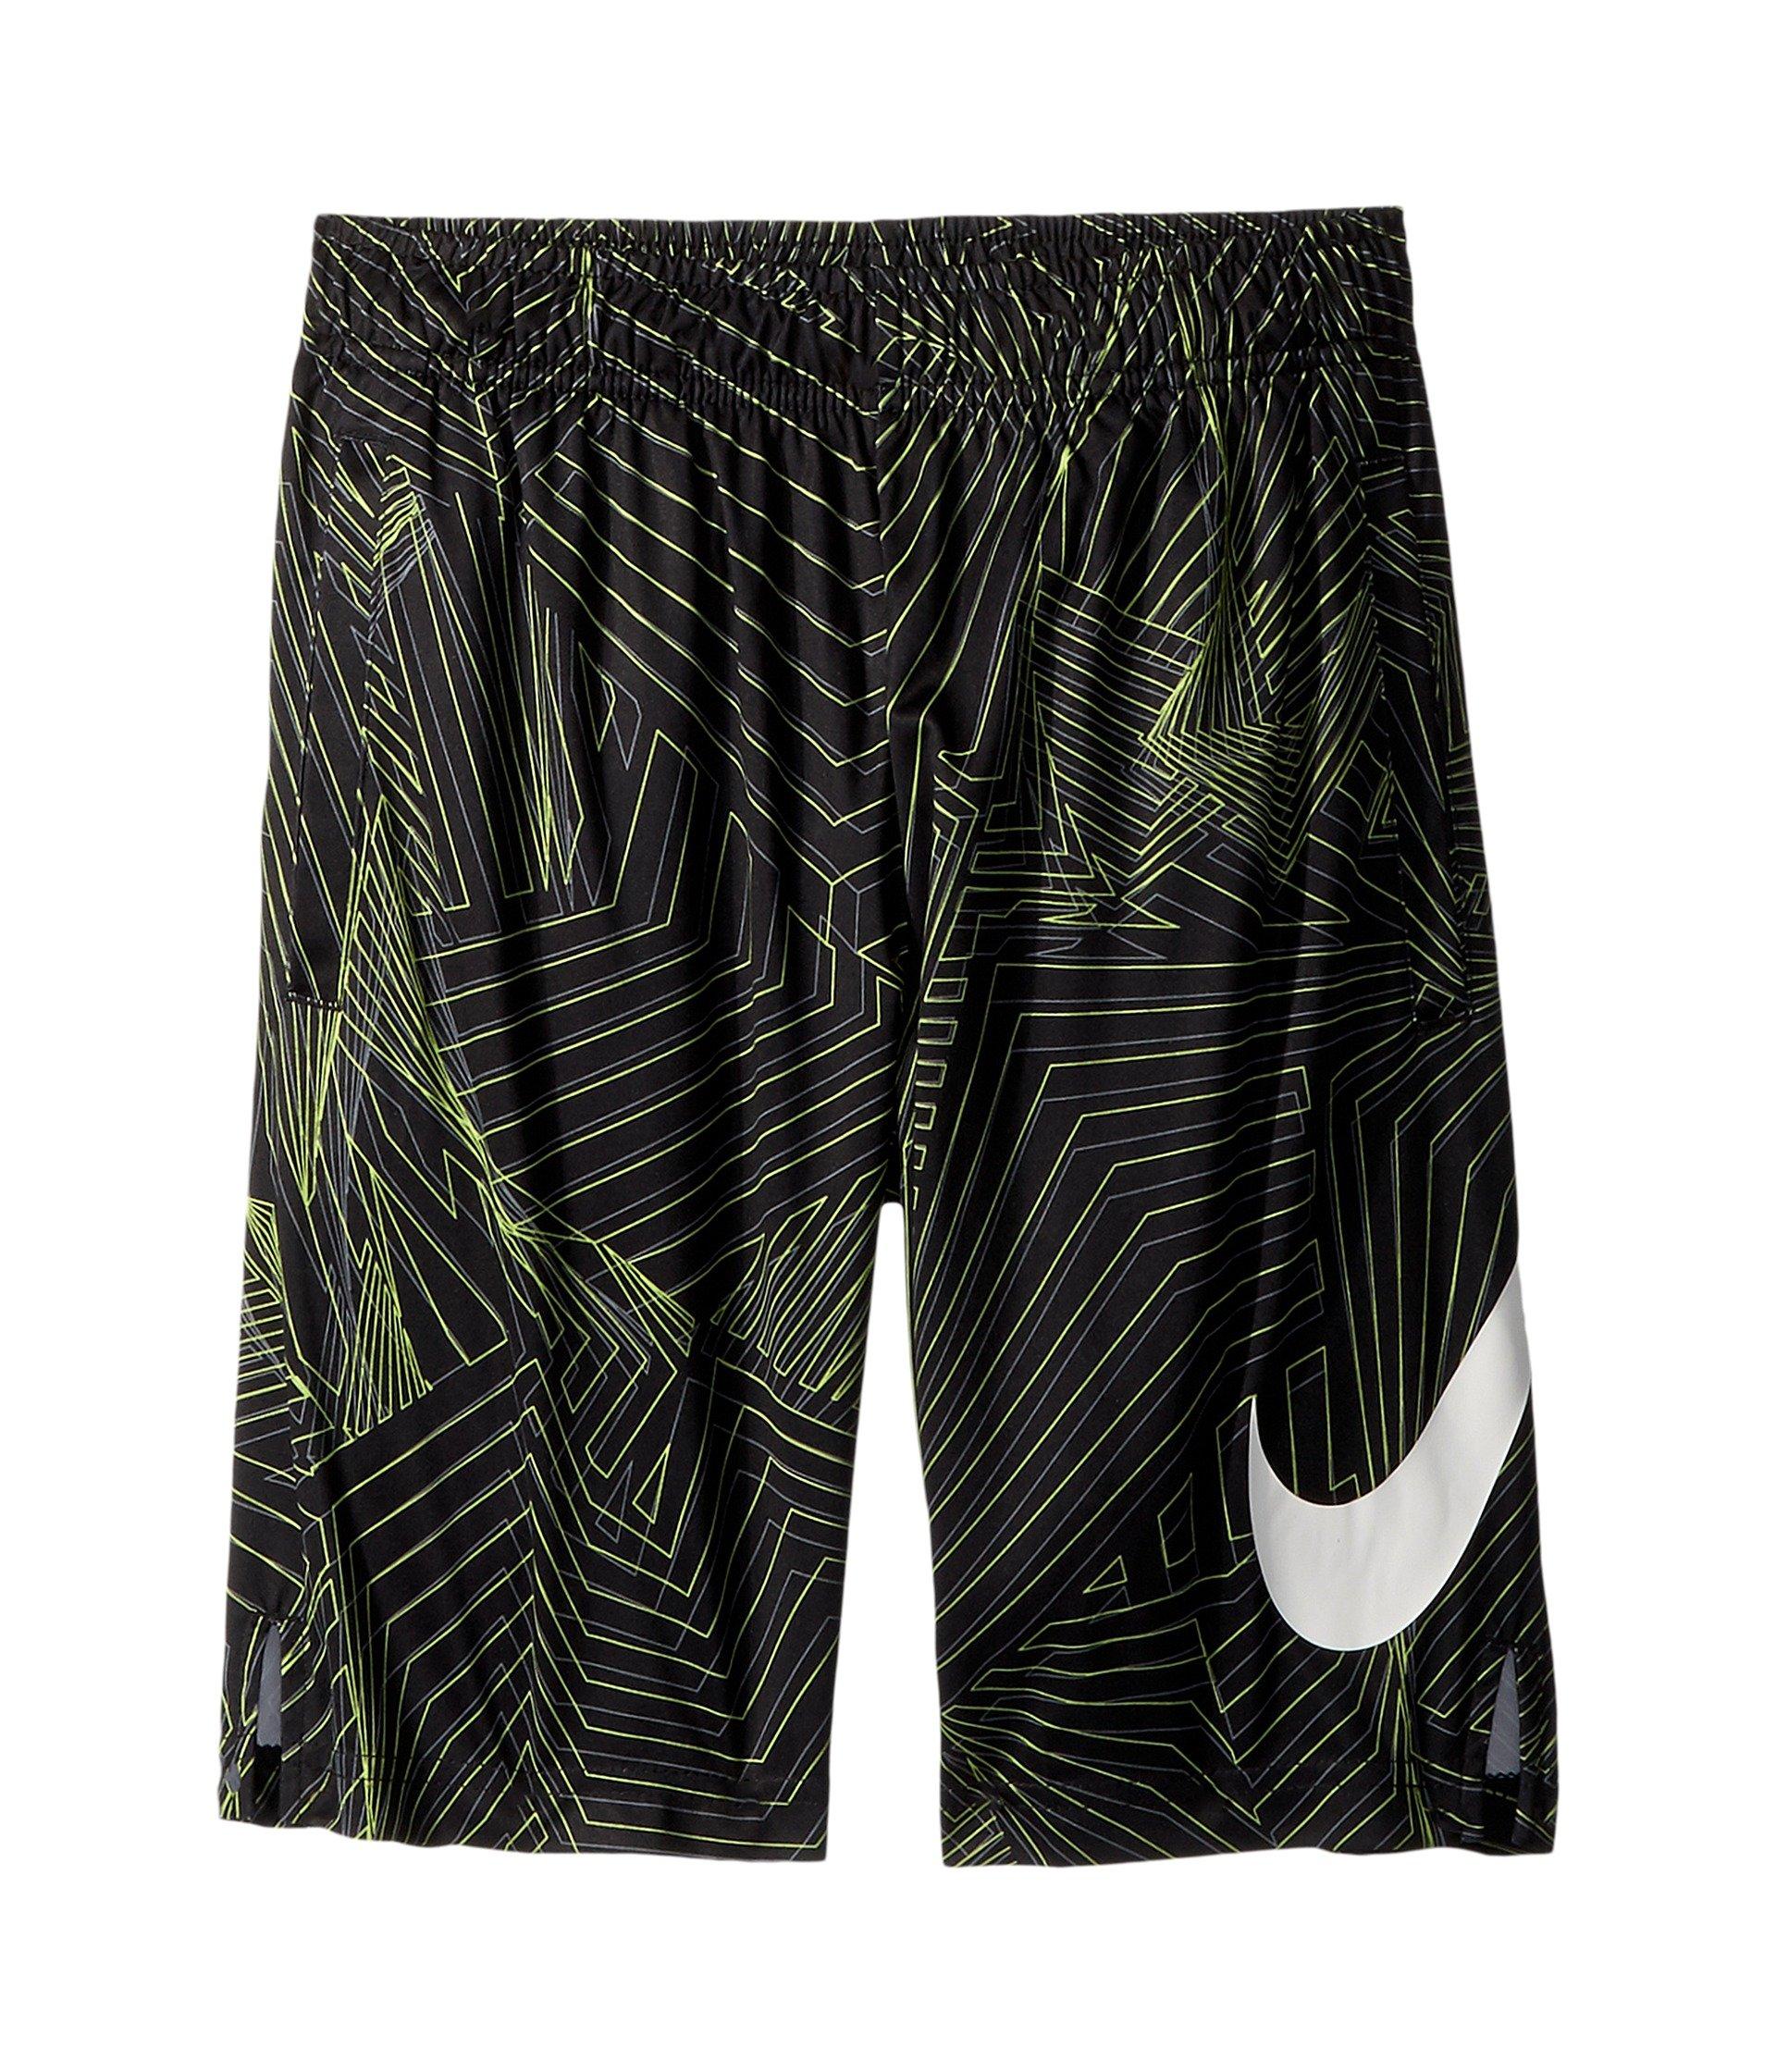 Nike Kids Boy's Dry Print Training Short (Big Kids) Black/White Large by Nike